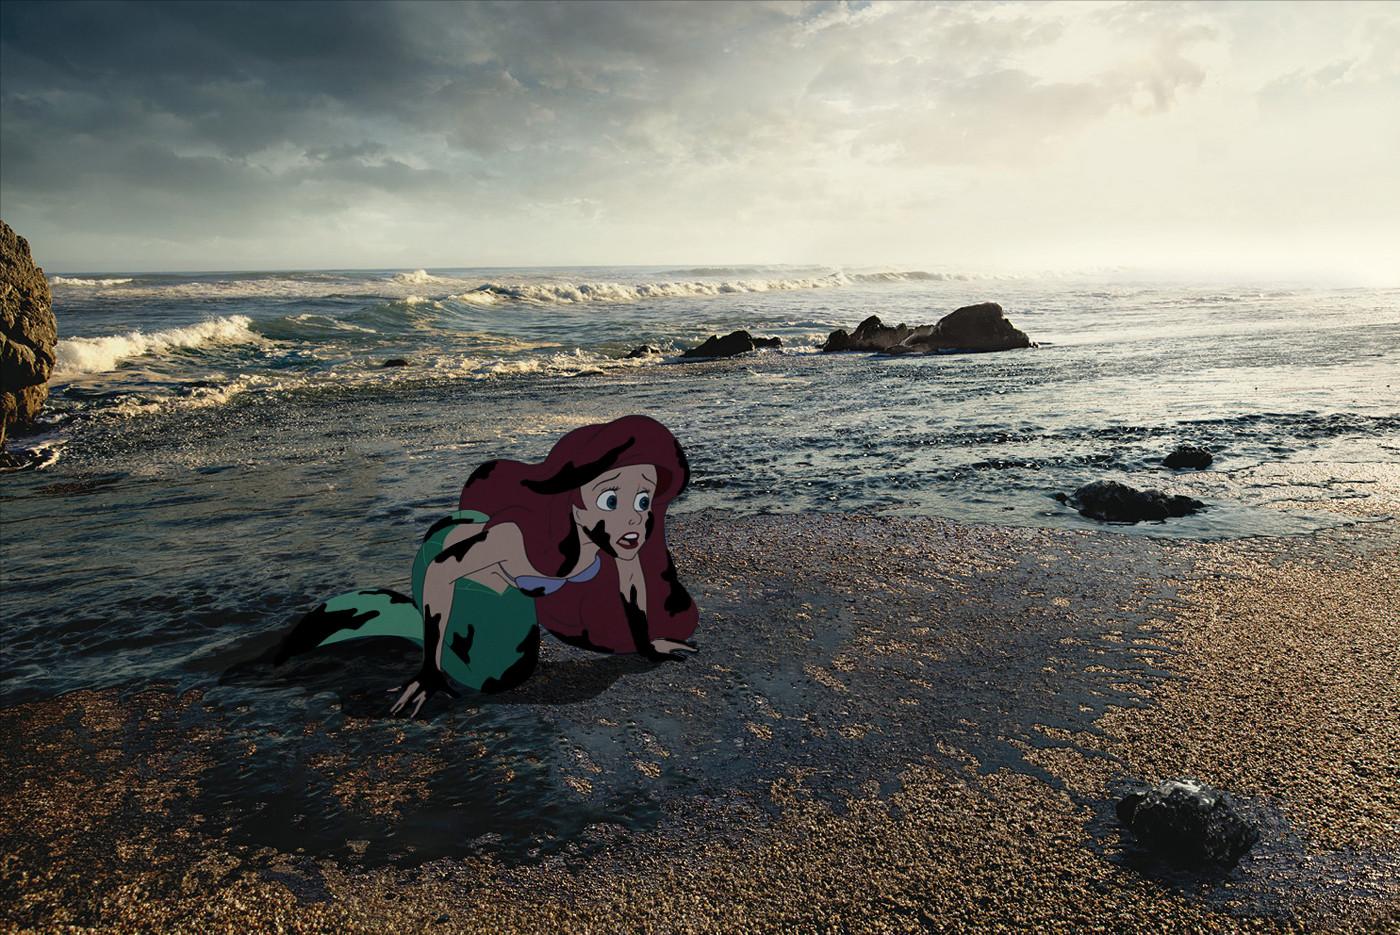 Unhappy Ariel